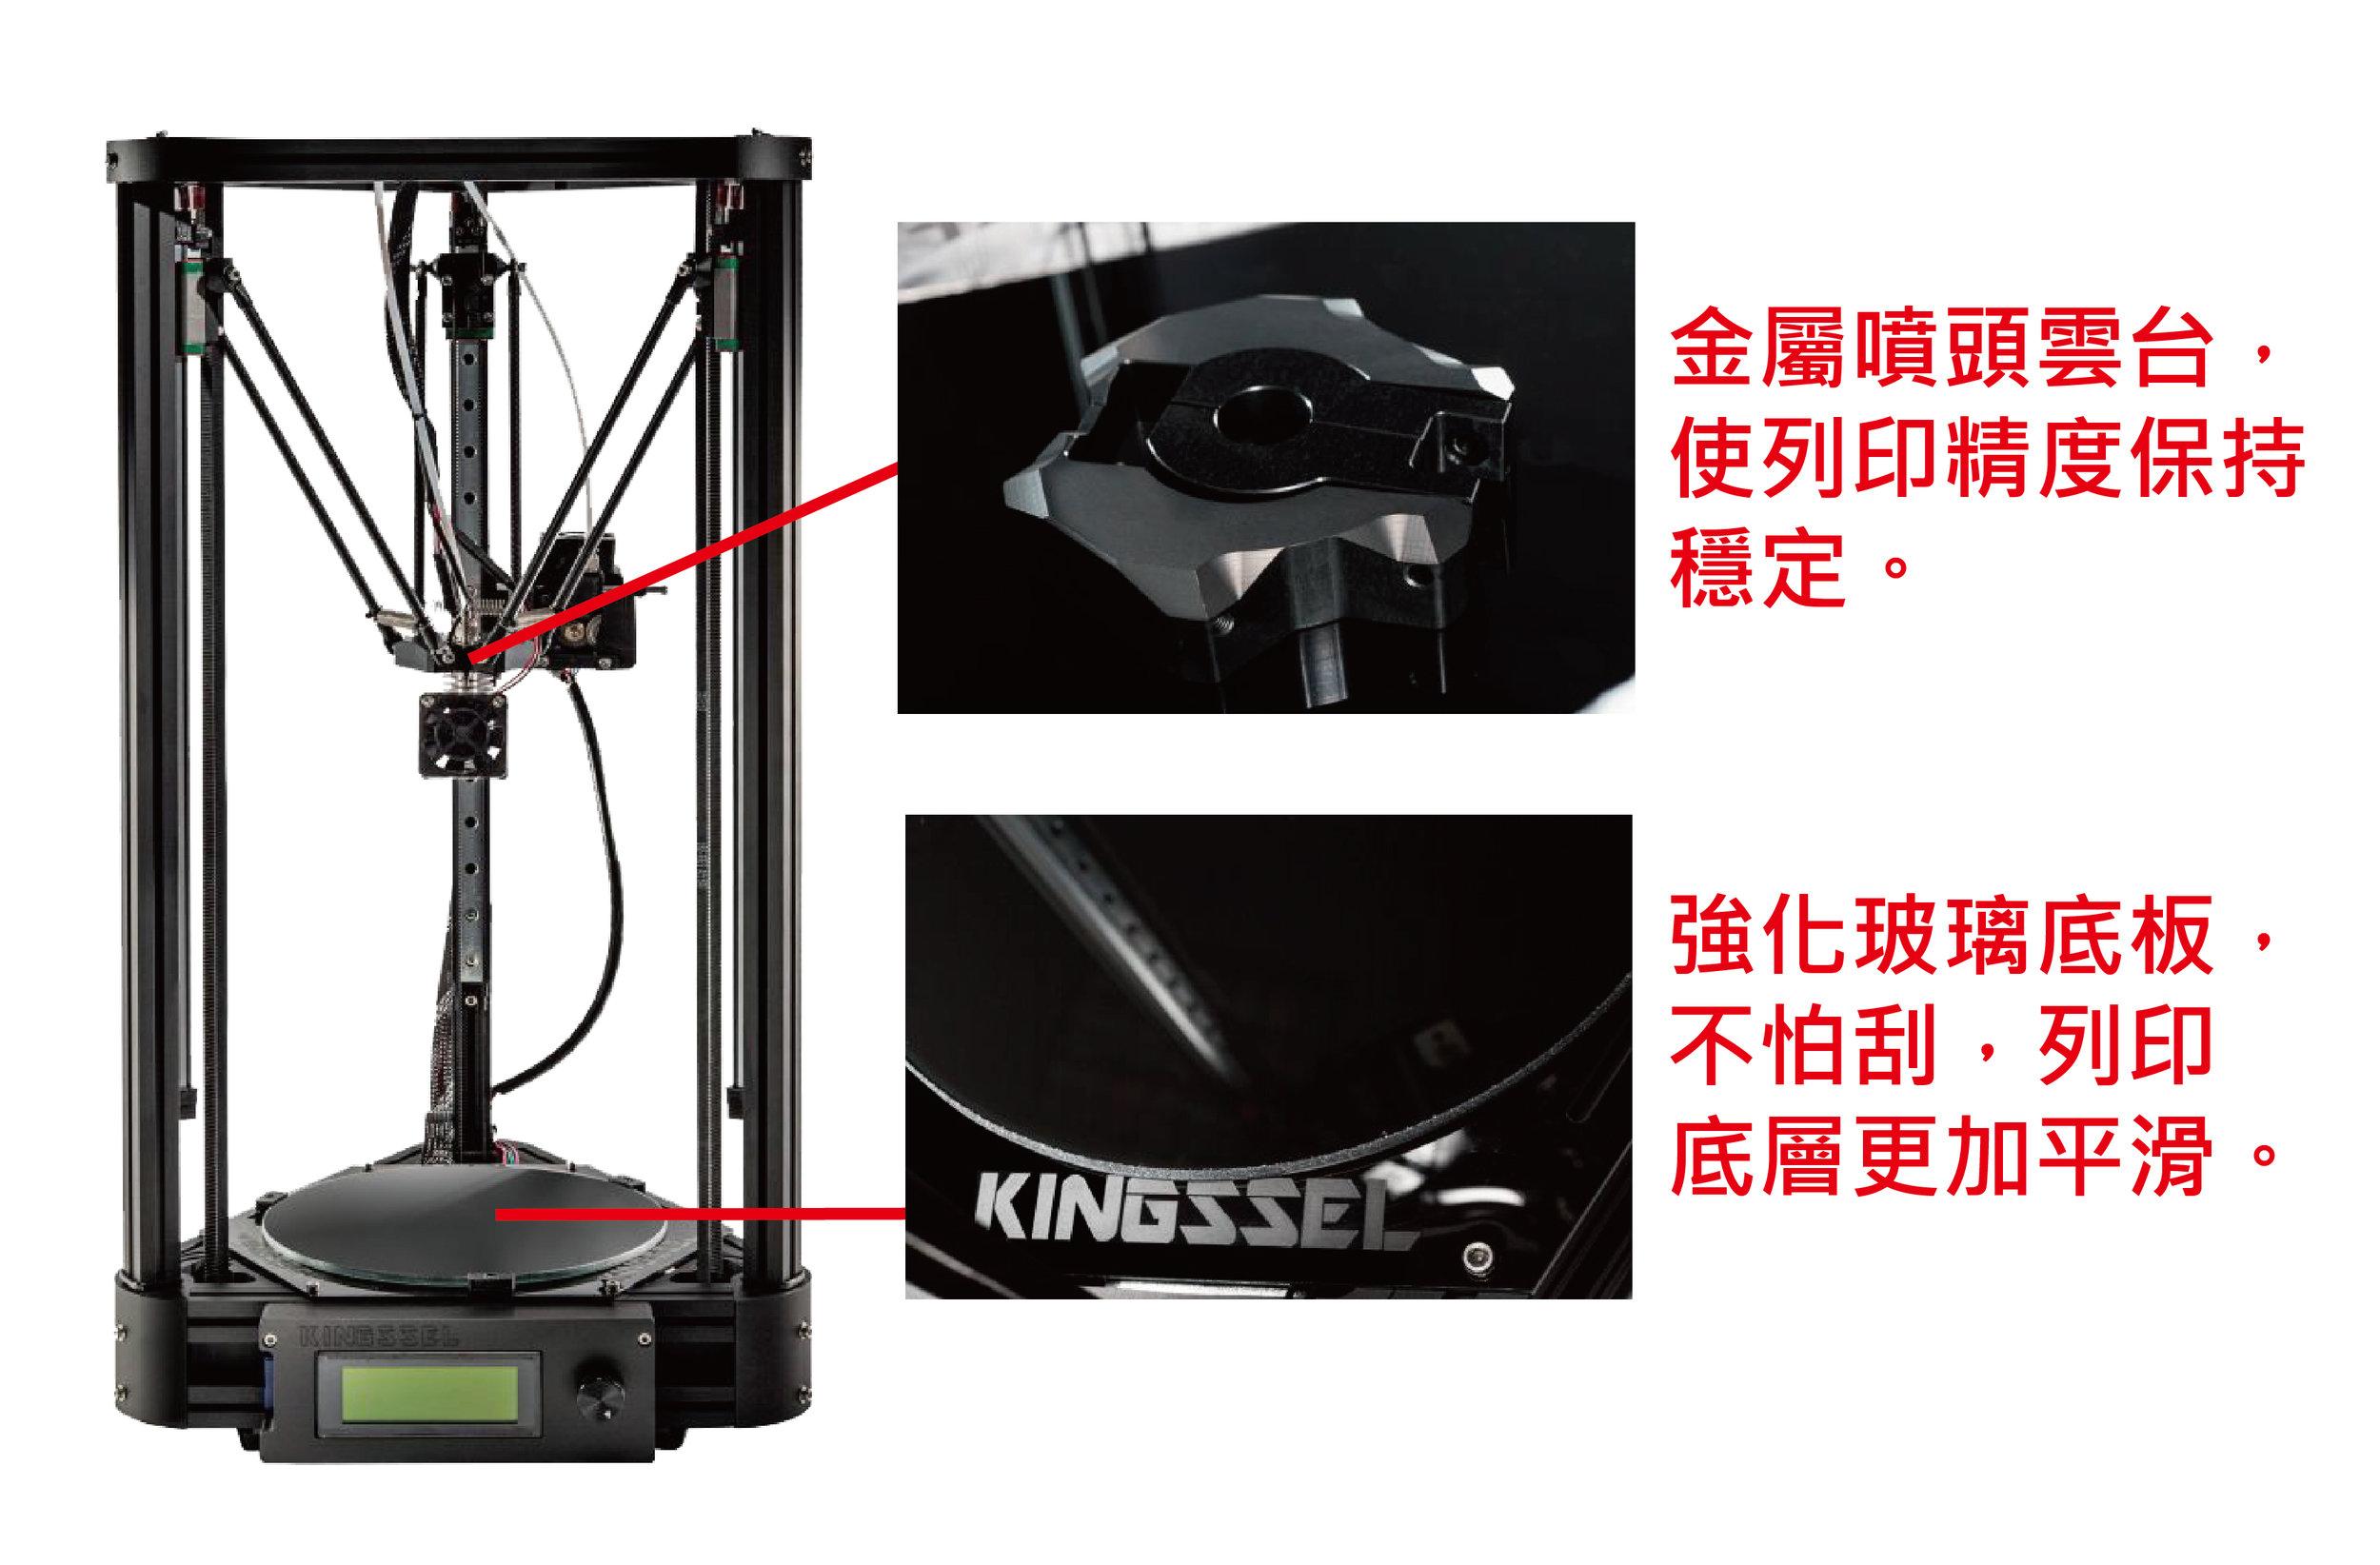 KINGSSEL1820 3D列印機 國王機 p3.jpg